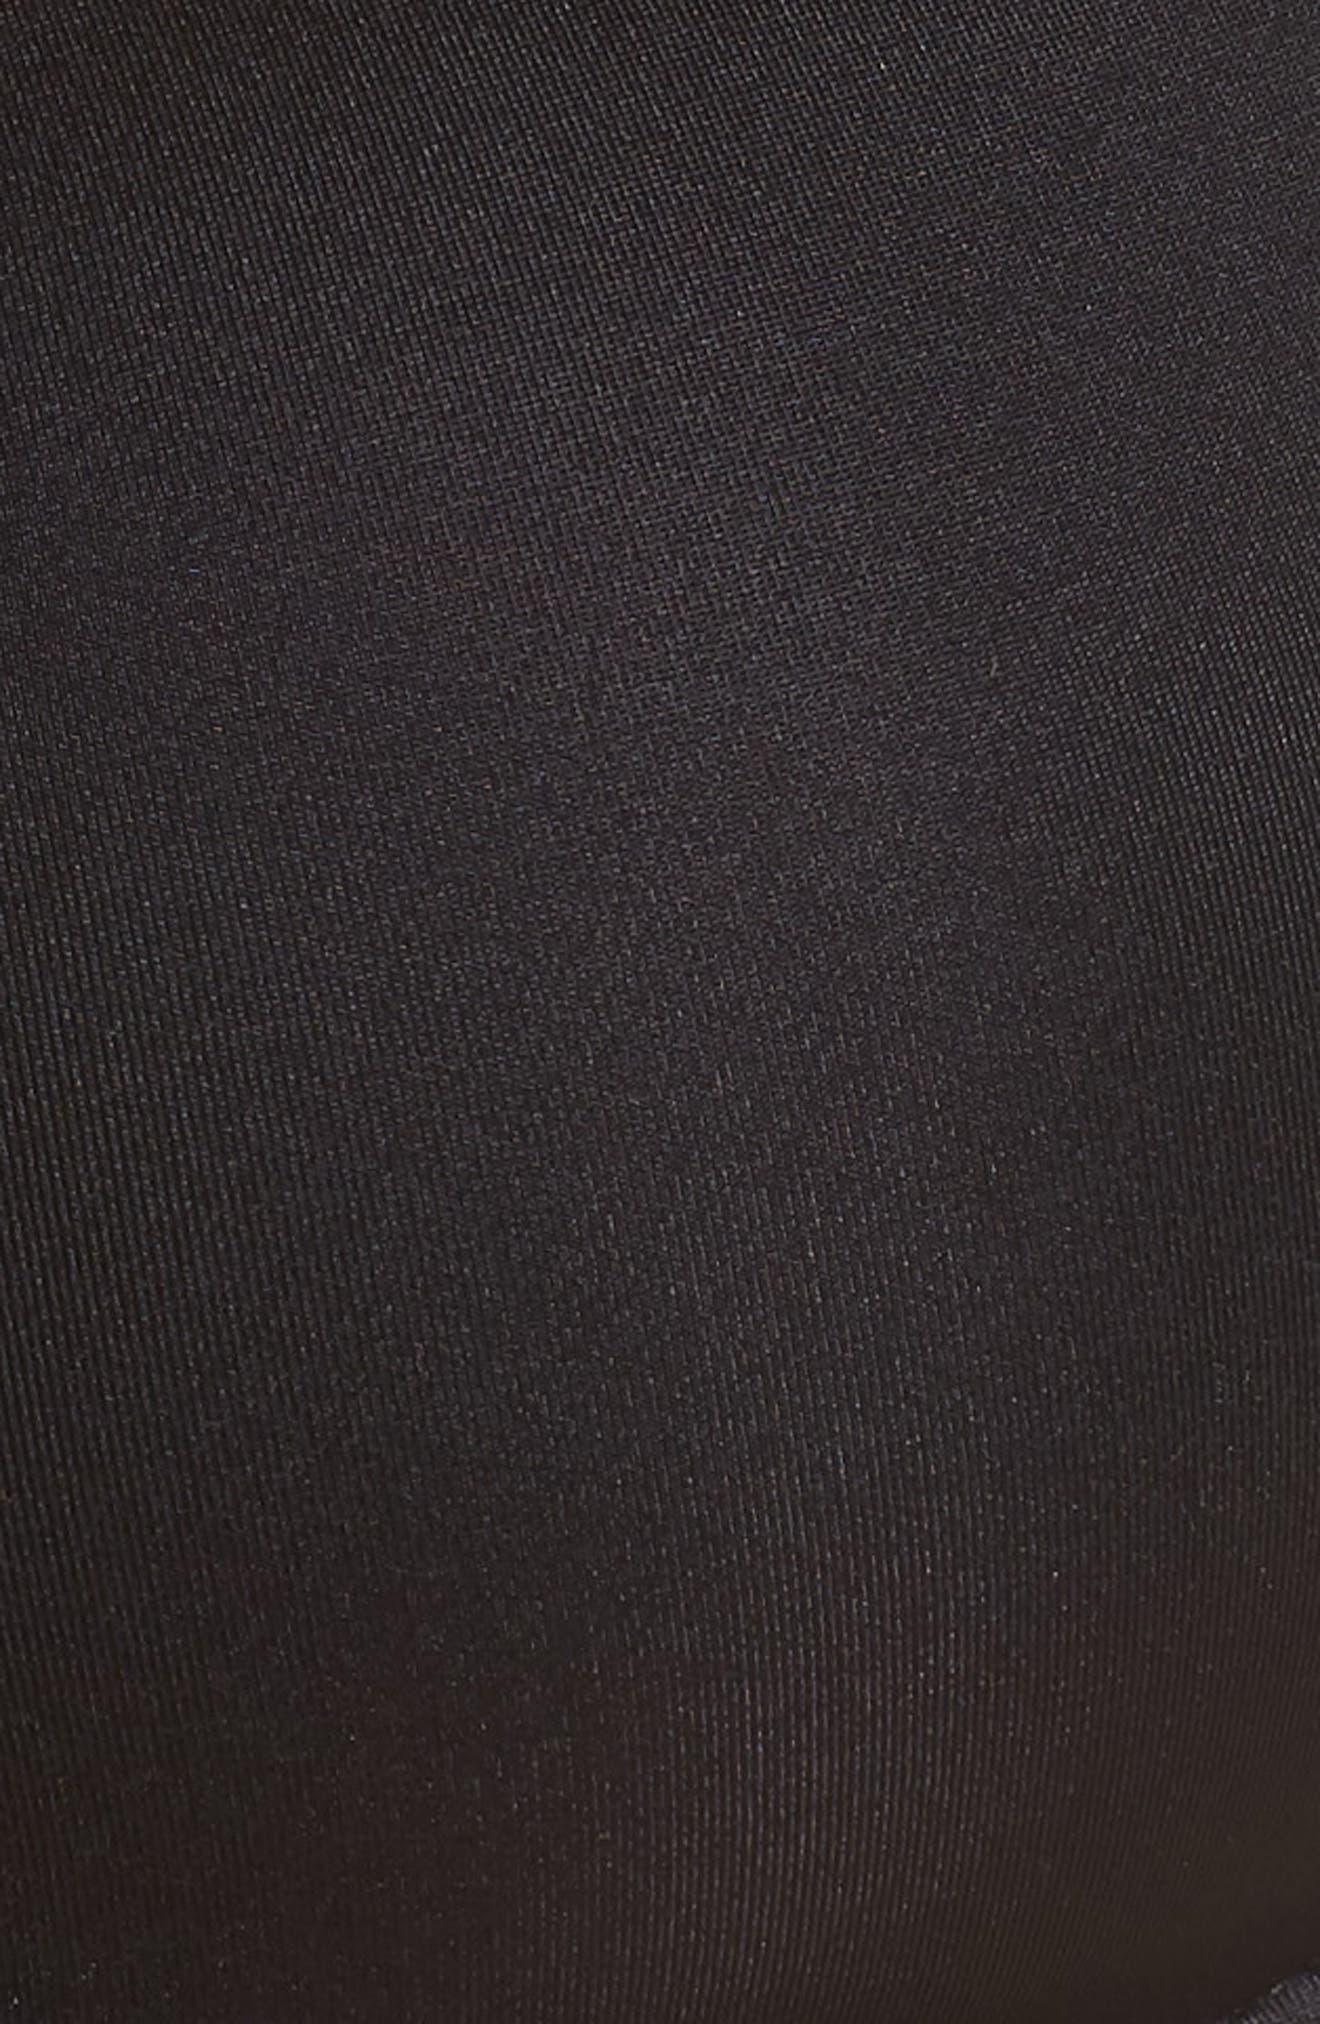 Magical Strapess Underwire Bra,                             Alternate thumbnail 7, color,                             Black